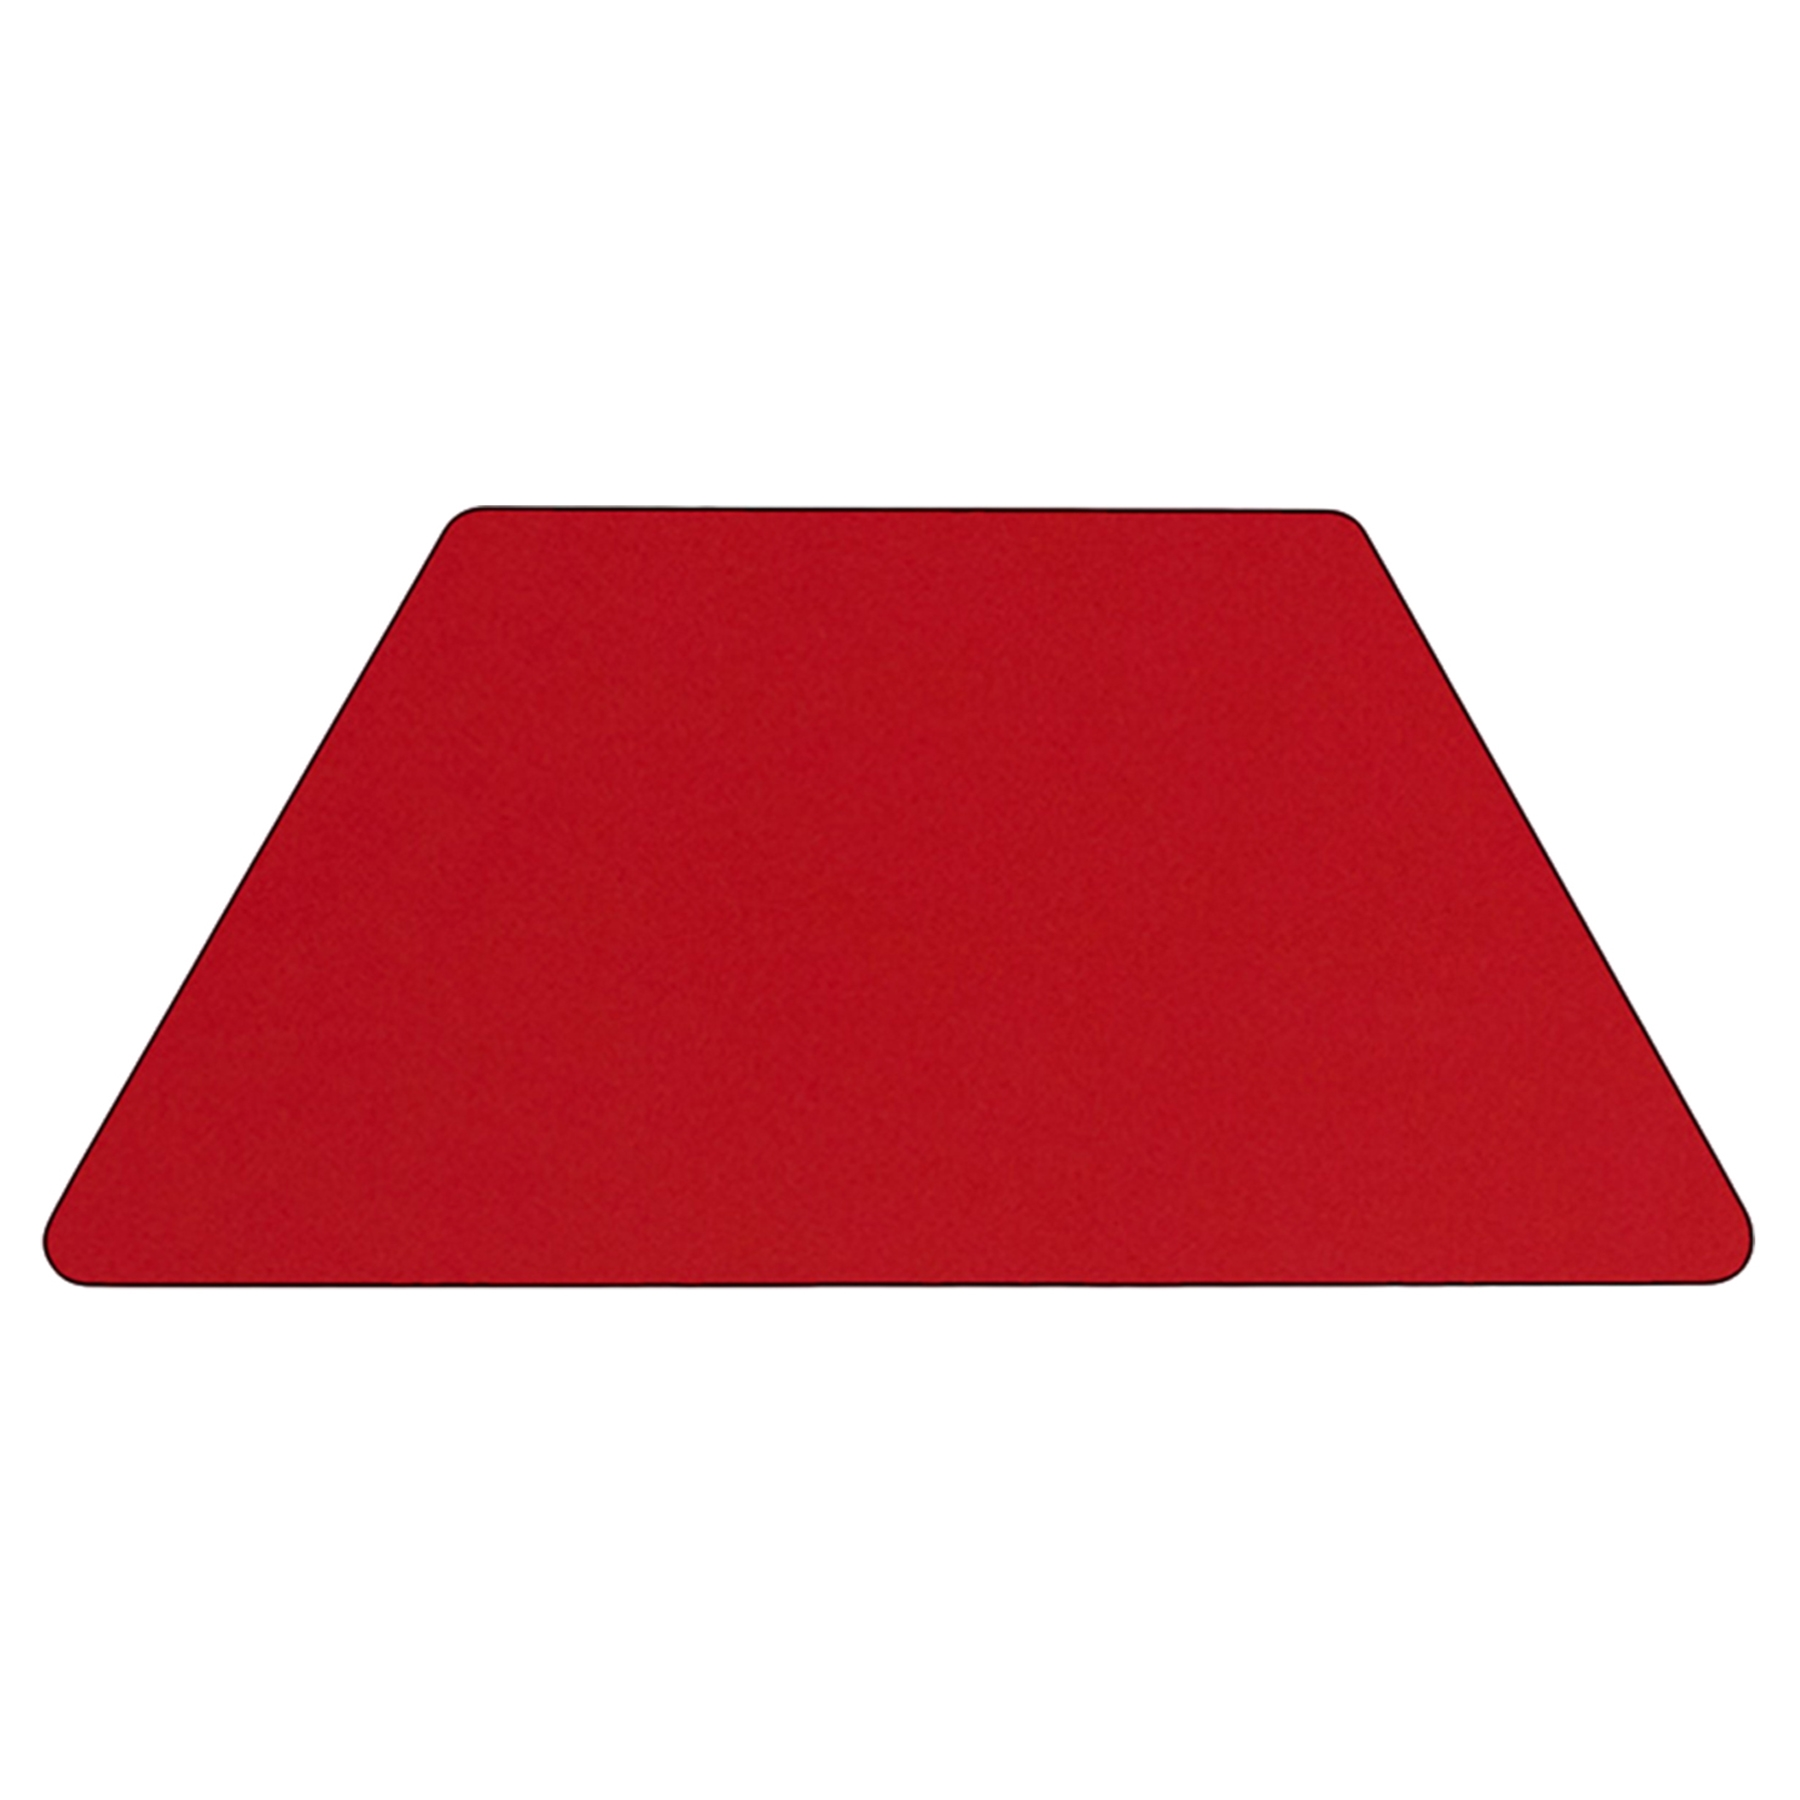 mobile 24 quot x 48 quot trapezoid preschool activity table red [ 1800 x 1800 Pixel ]